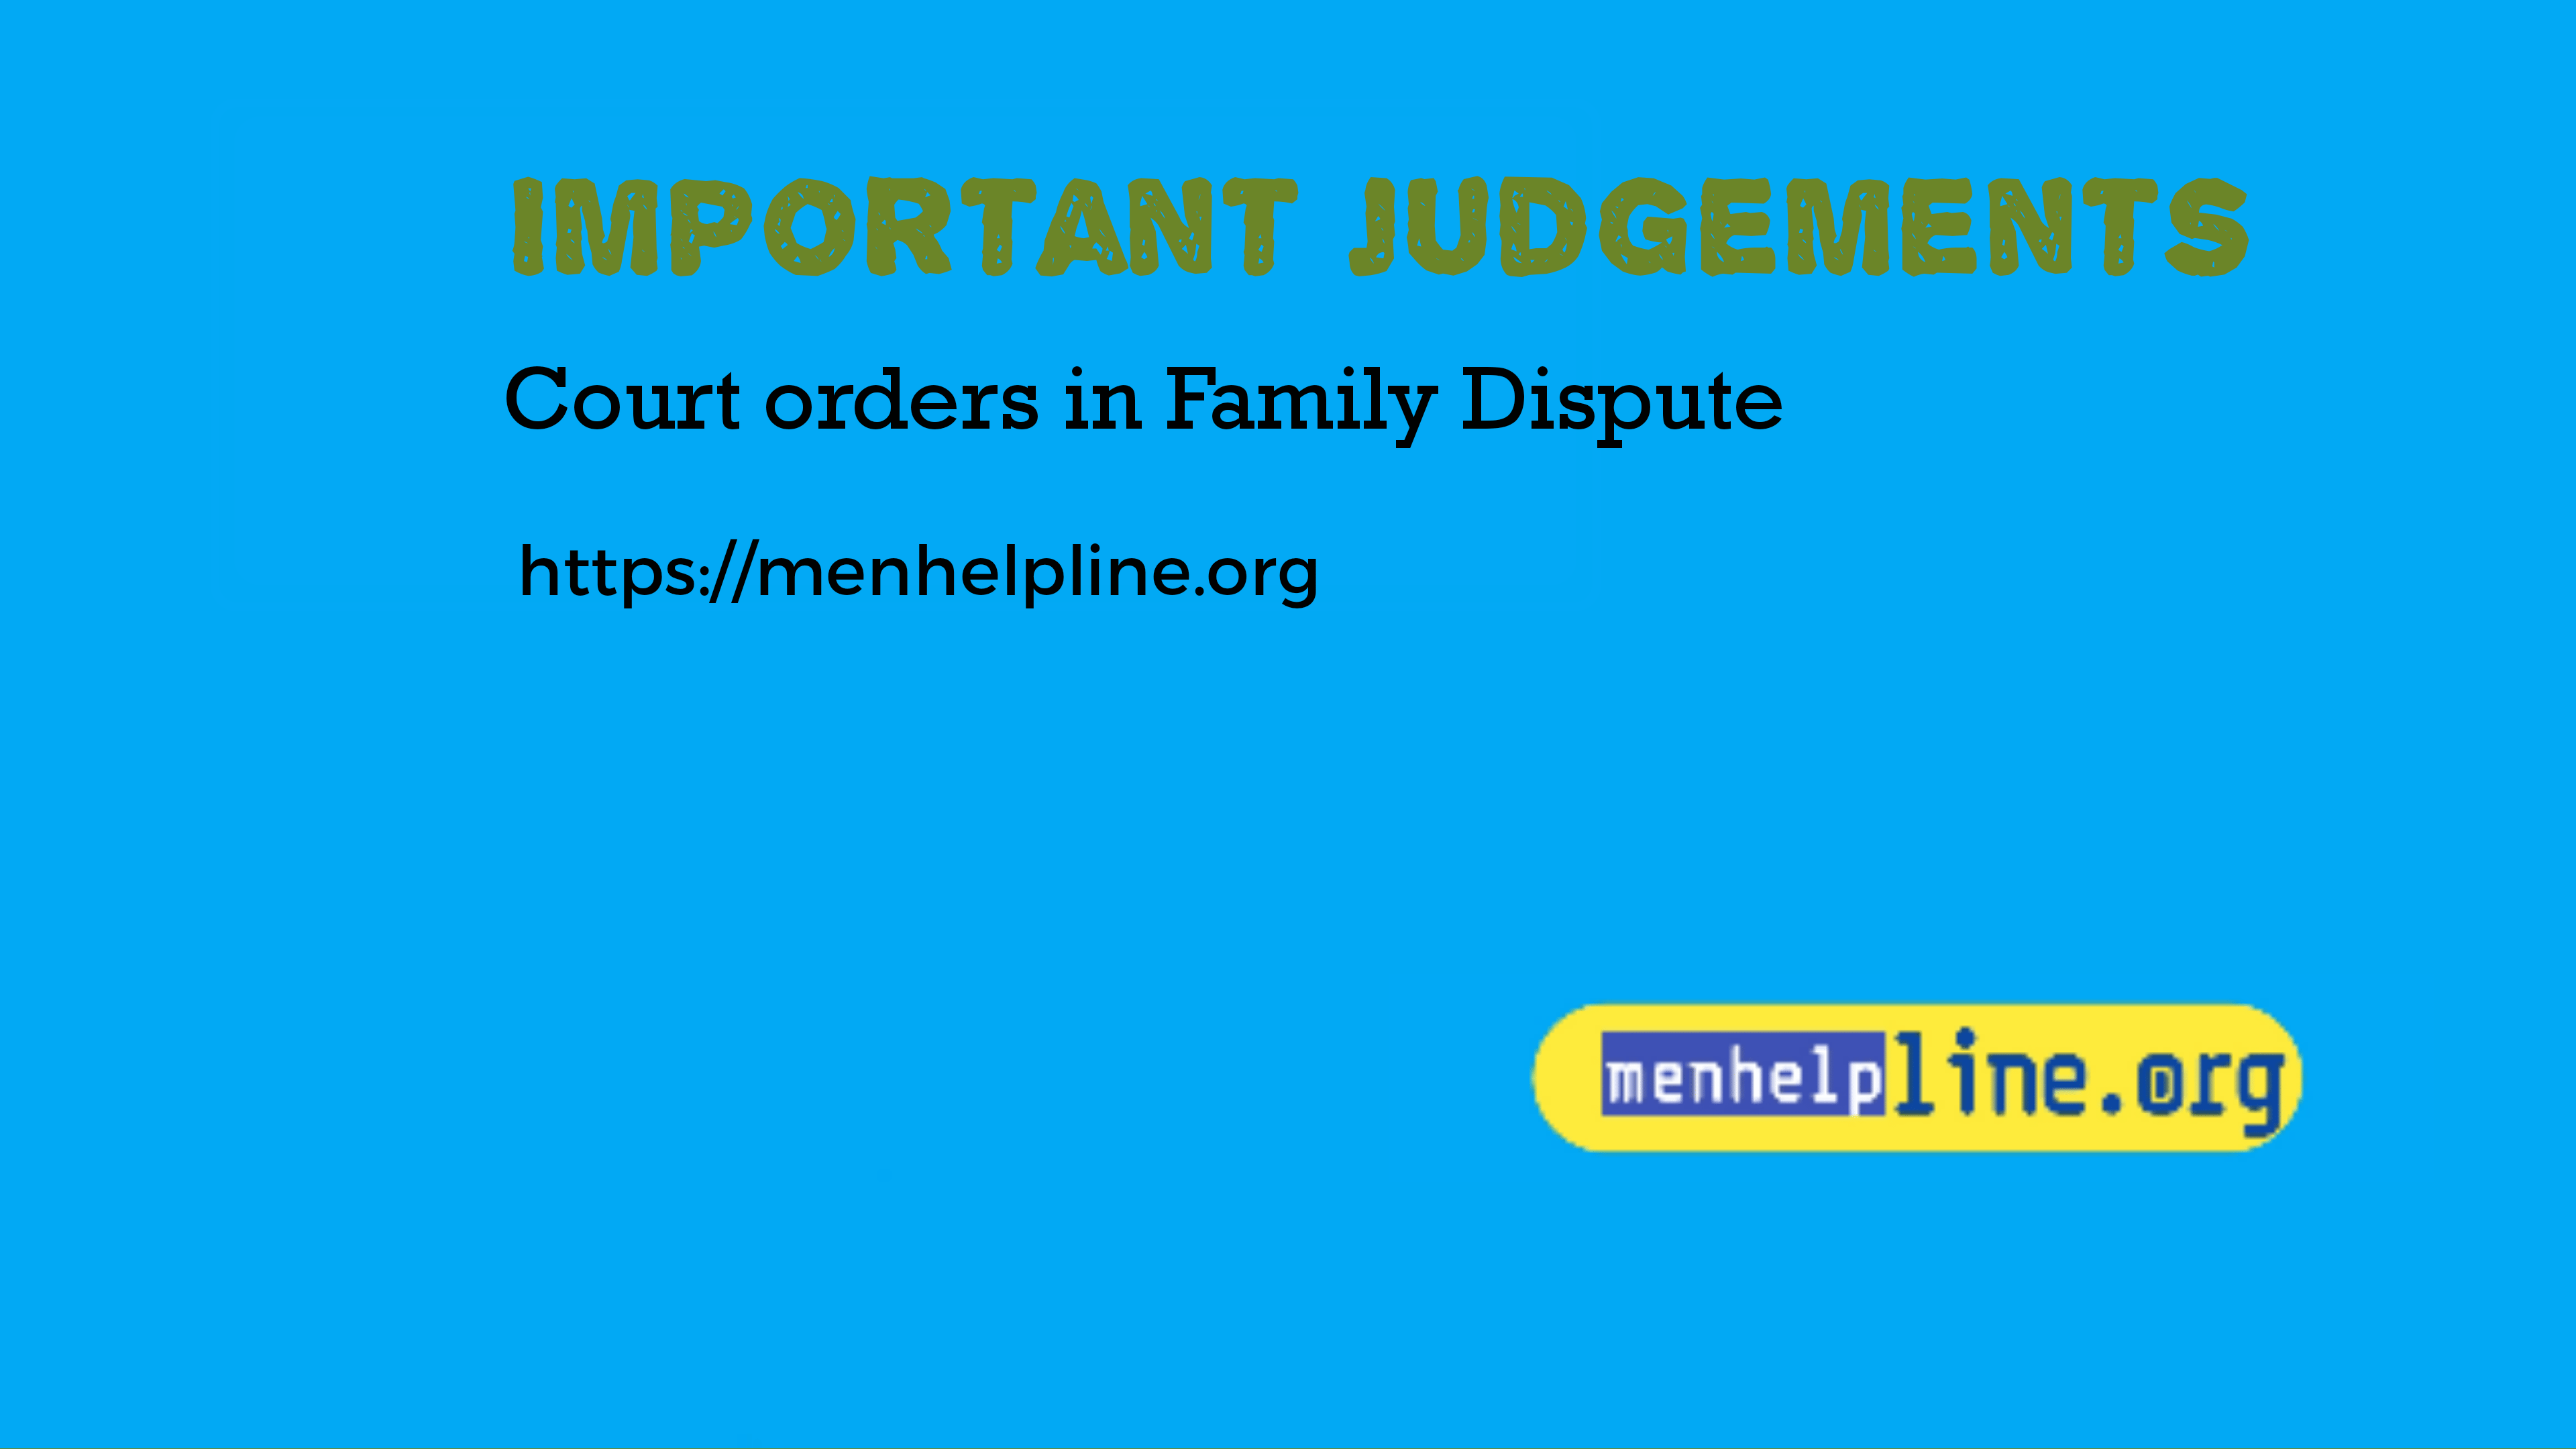 Important Judgement at Men Helpline